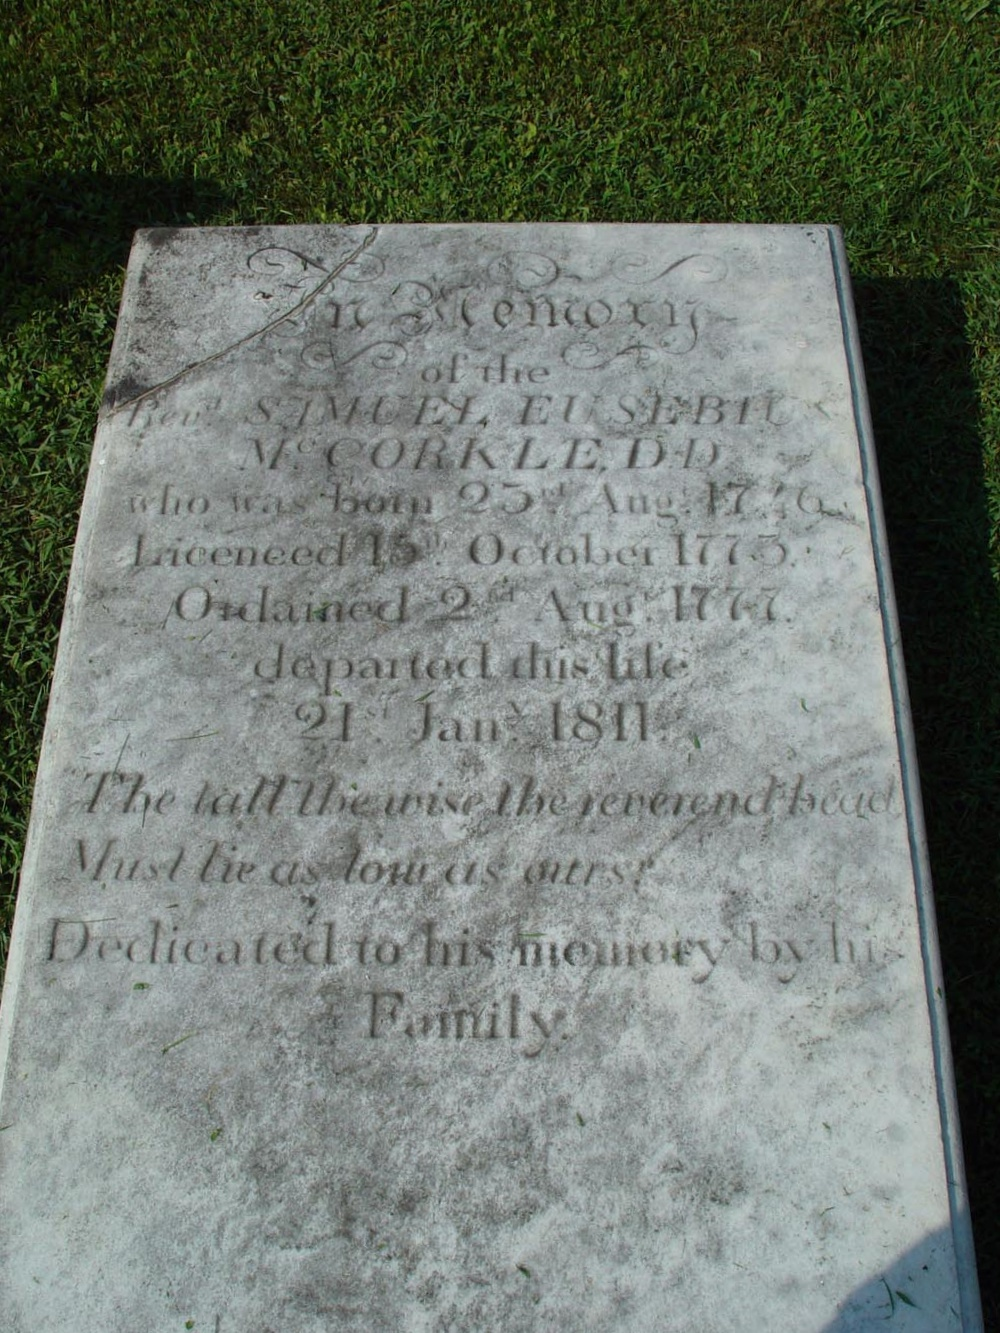 Samuel Eusebius McCorkle is buried at Thyatira Presbyterian Church Cemetery, Mill Bridge, North Carolina.